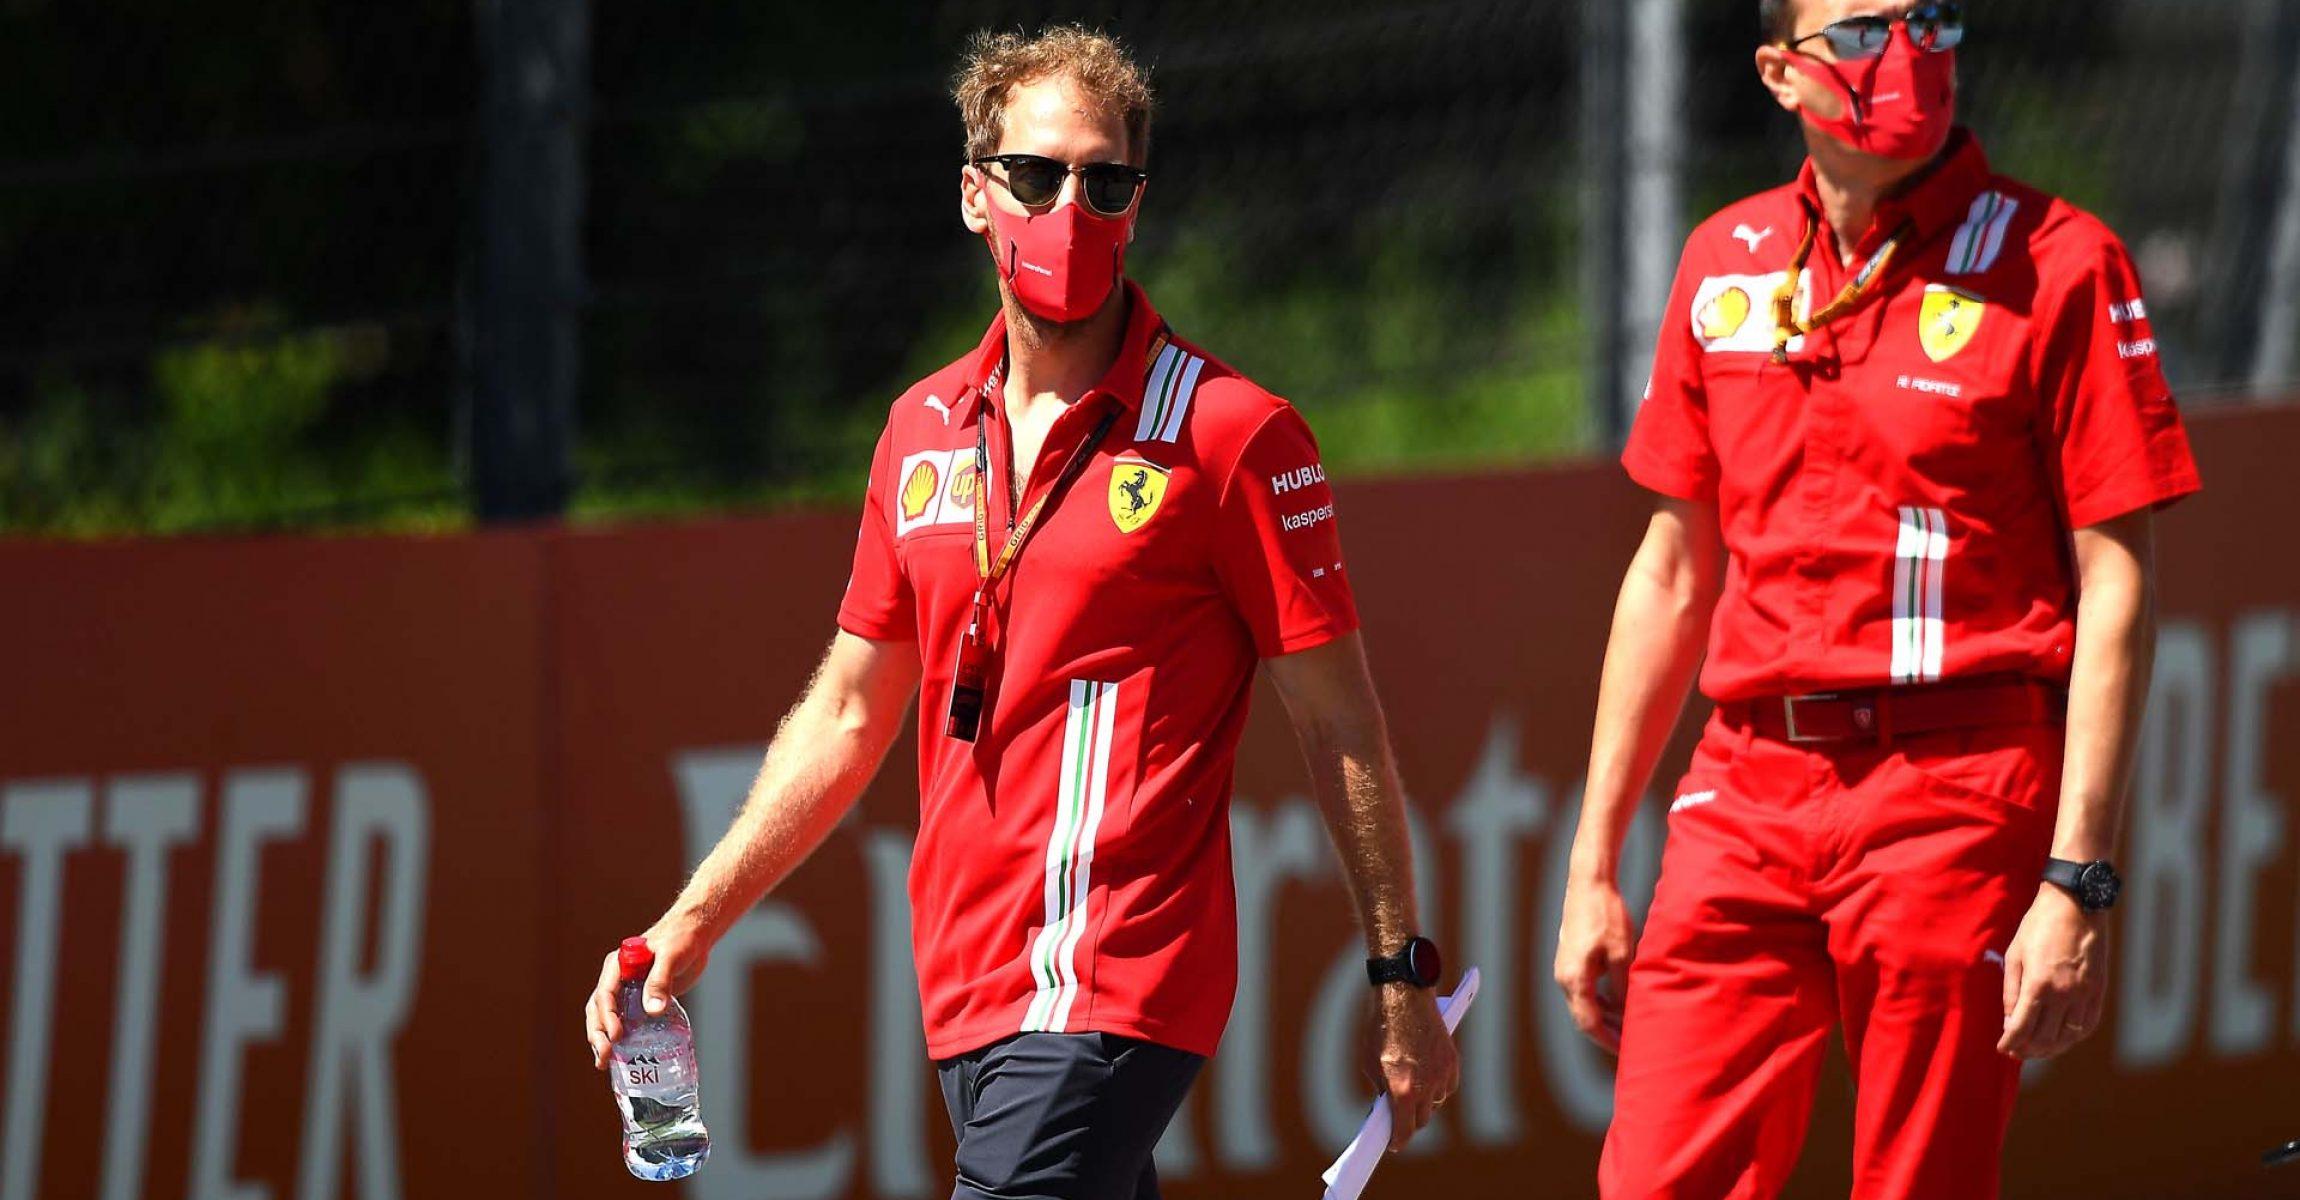 GP AUSTRIA F1/2020 - GIOVEDÌ 02/07/2020 credit: @Scuderia Ferrari Press Office Sebastian Vettel